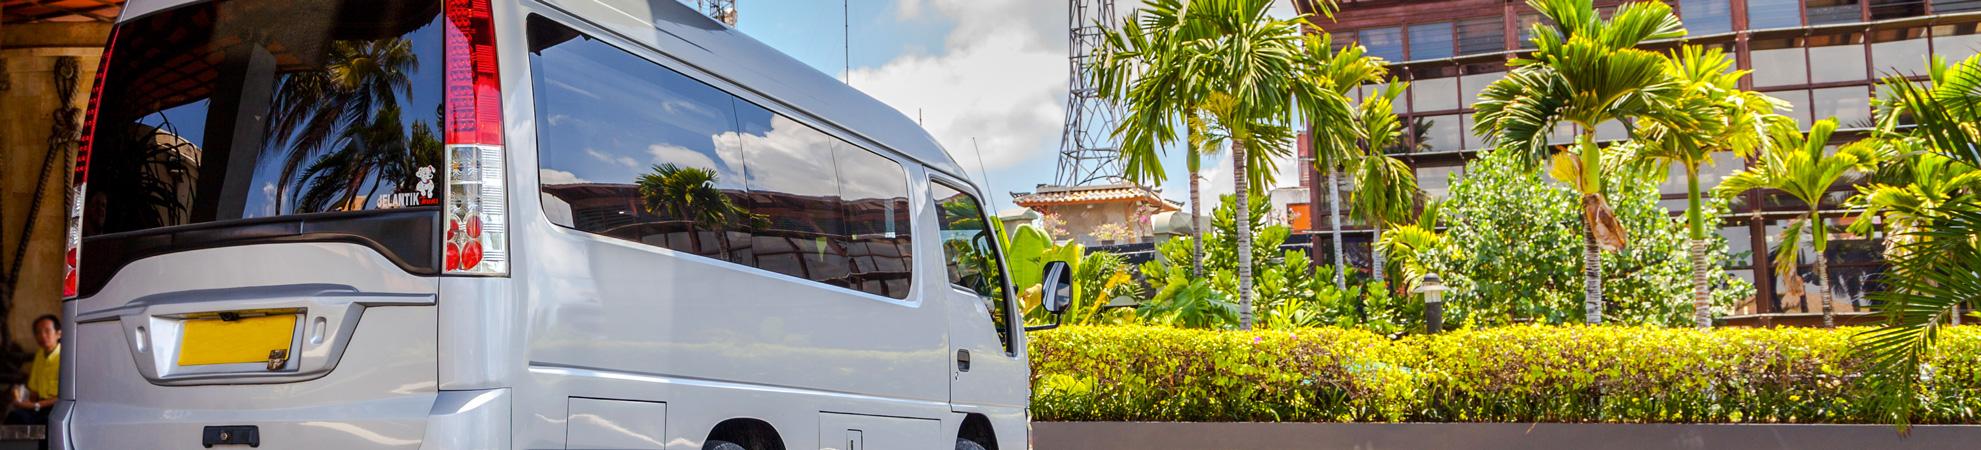 Aller à Bali en bus